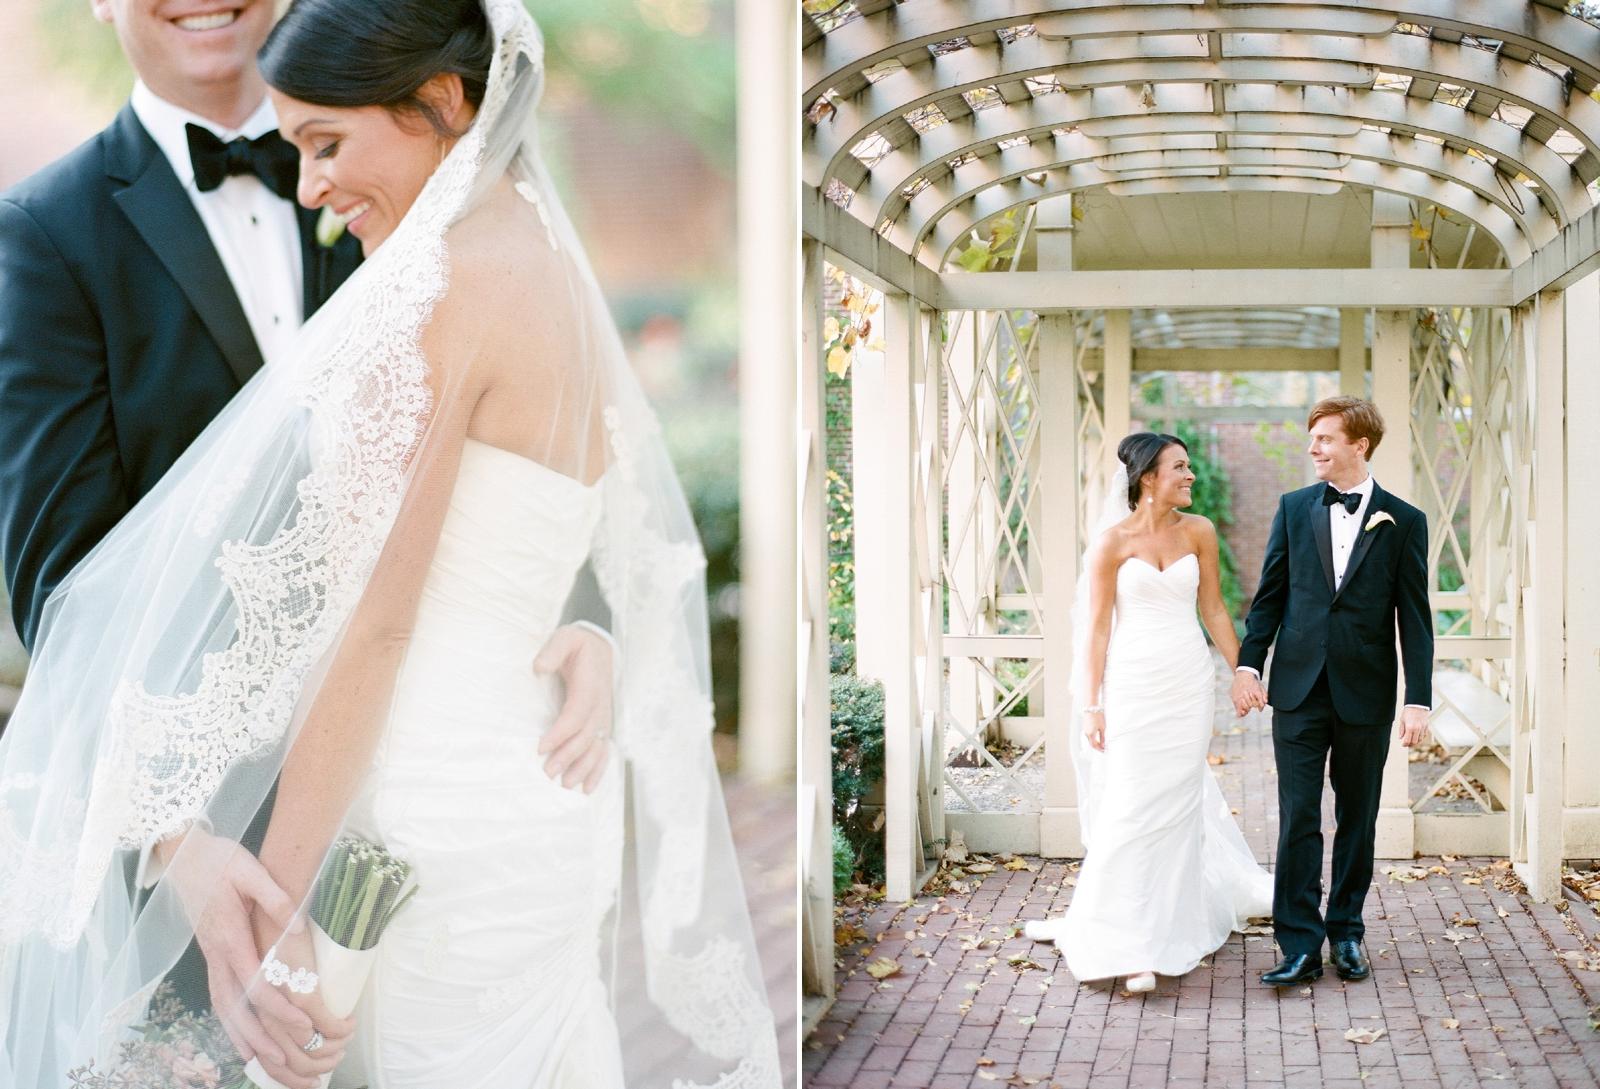 atrium at curtis center wedding photographer philadelphia wedding photographer shannon griffin_0069.jpg